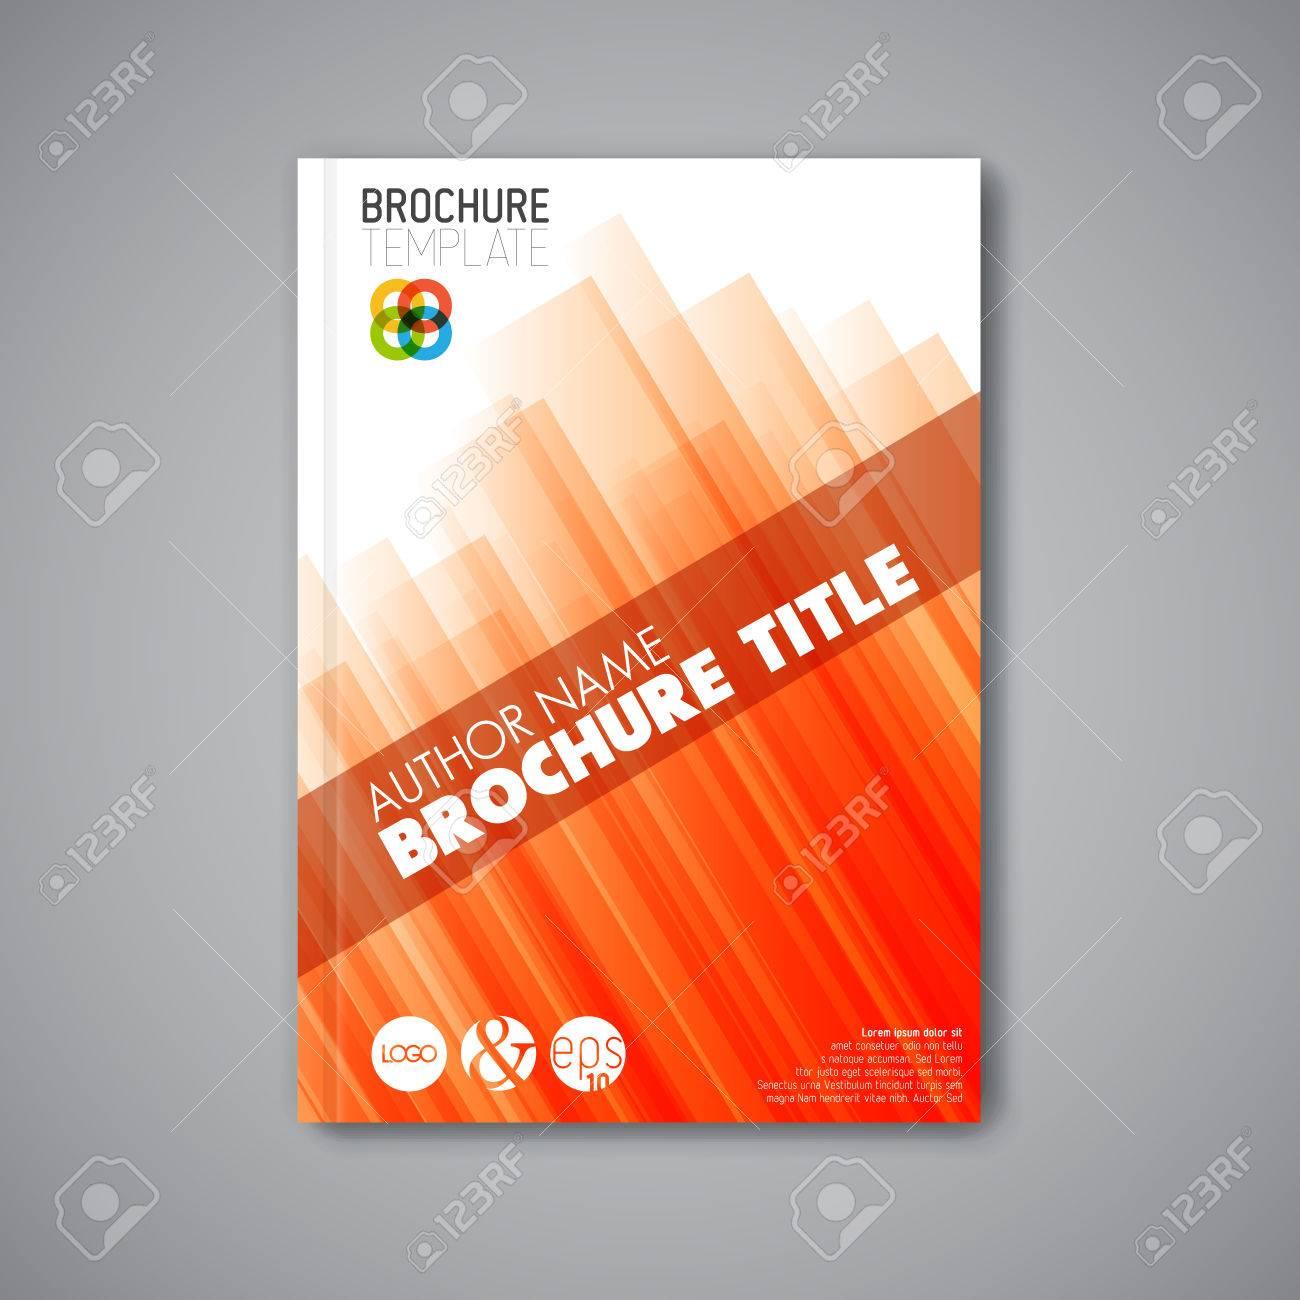 Modern Vector abstract brochure / book / flyer design template - orange version - 41662641